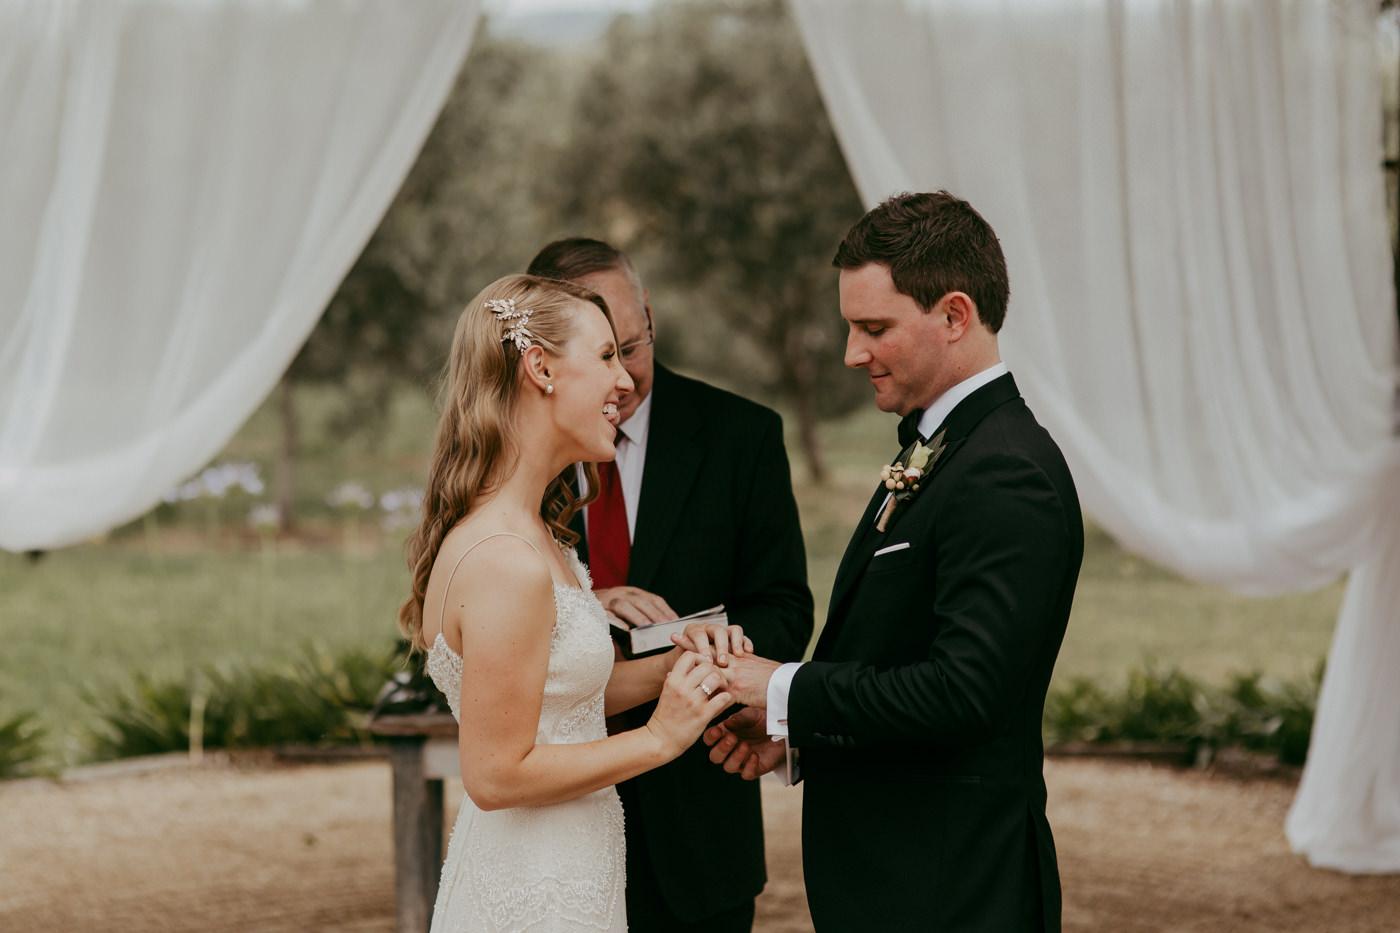 Anthony & Eliet - Wagga Wagga Wedding - Country NSW - Samantha Heather Photography-106.jpg